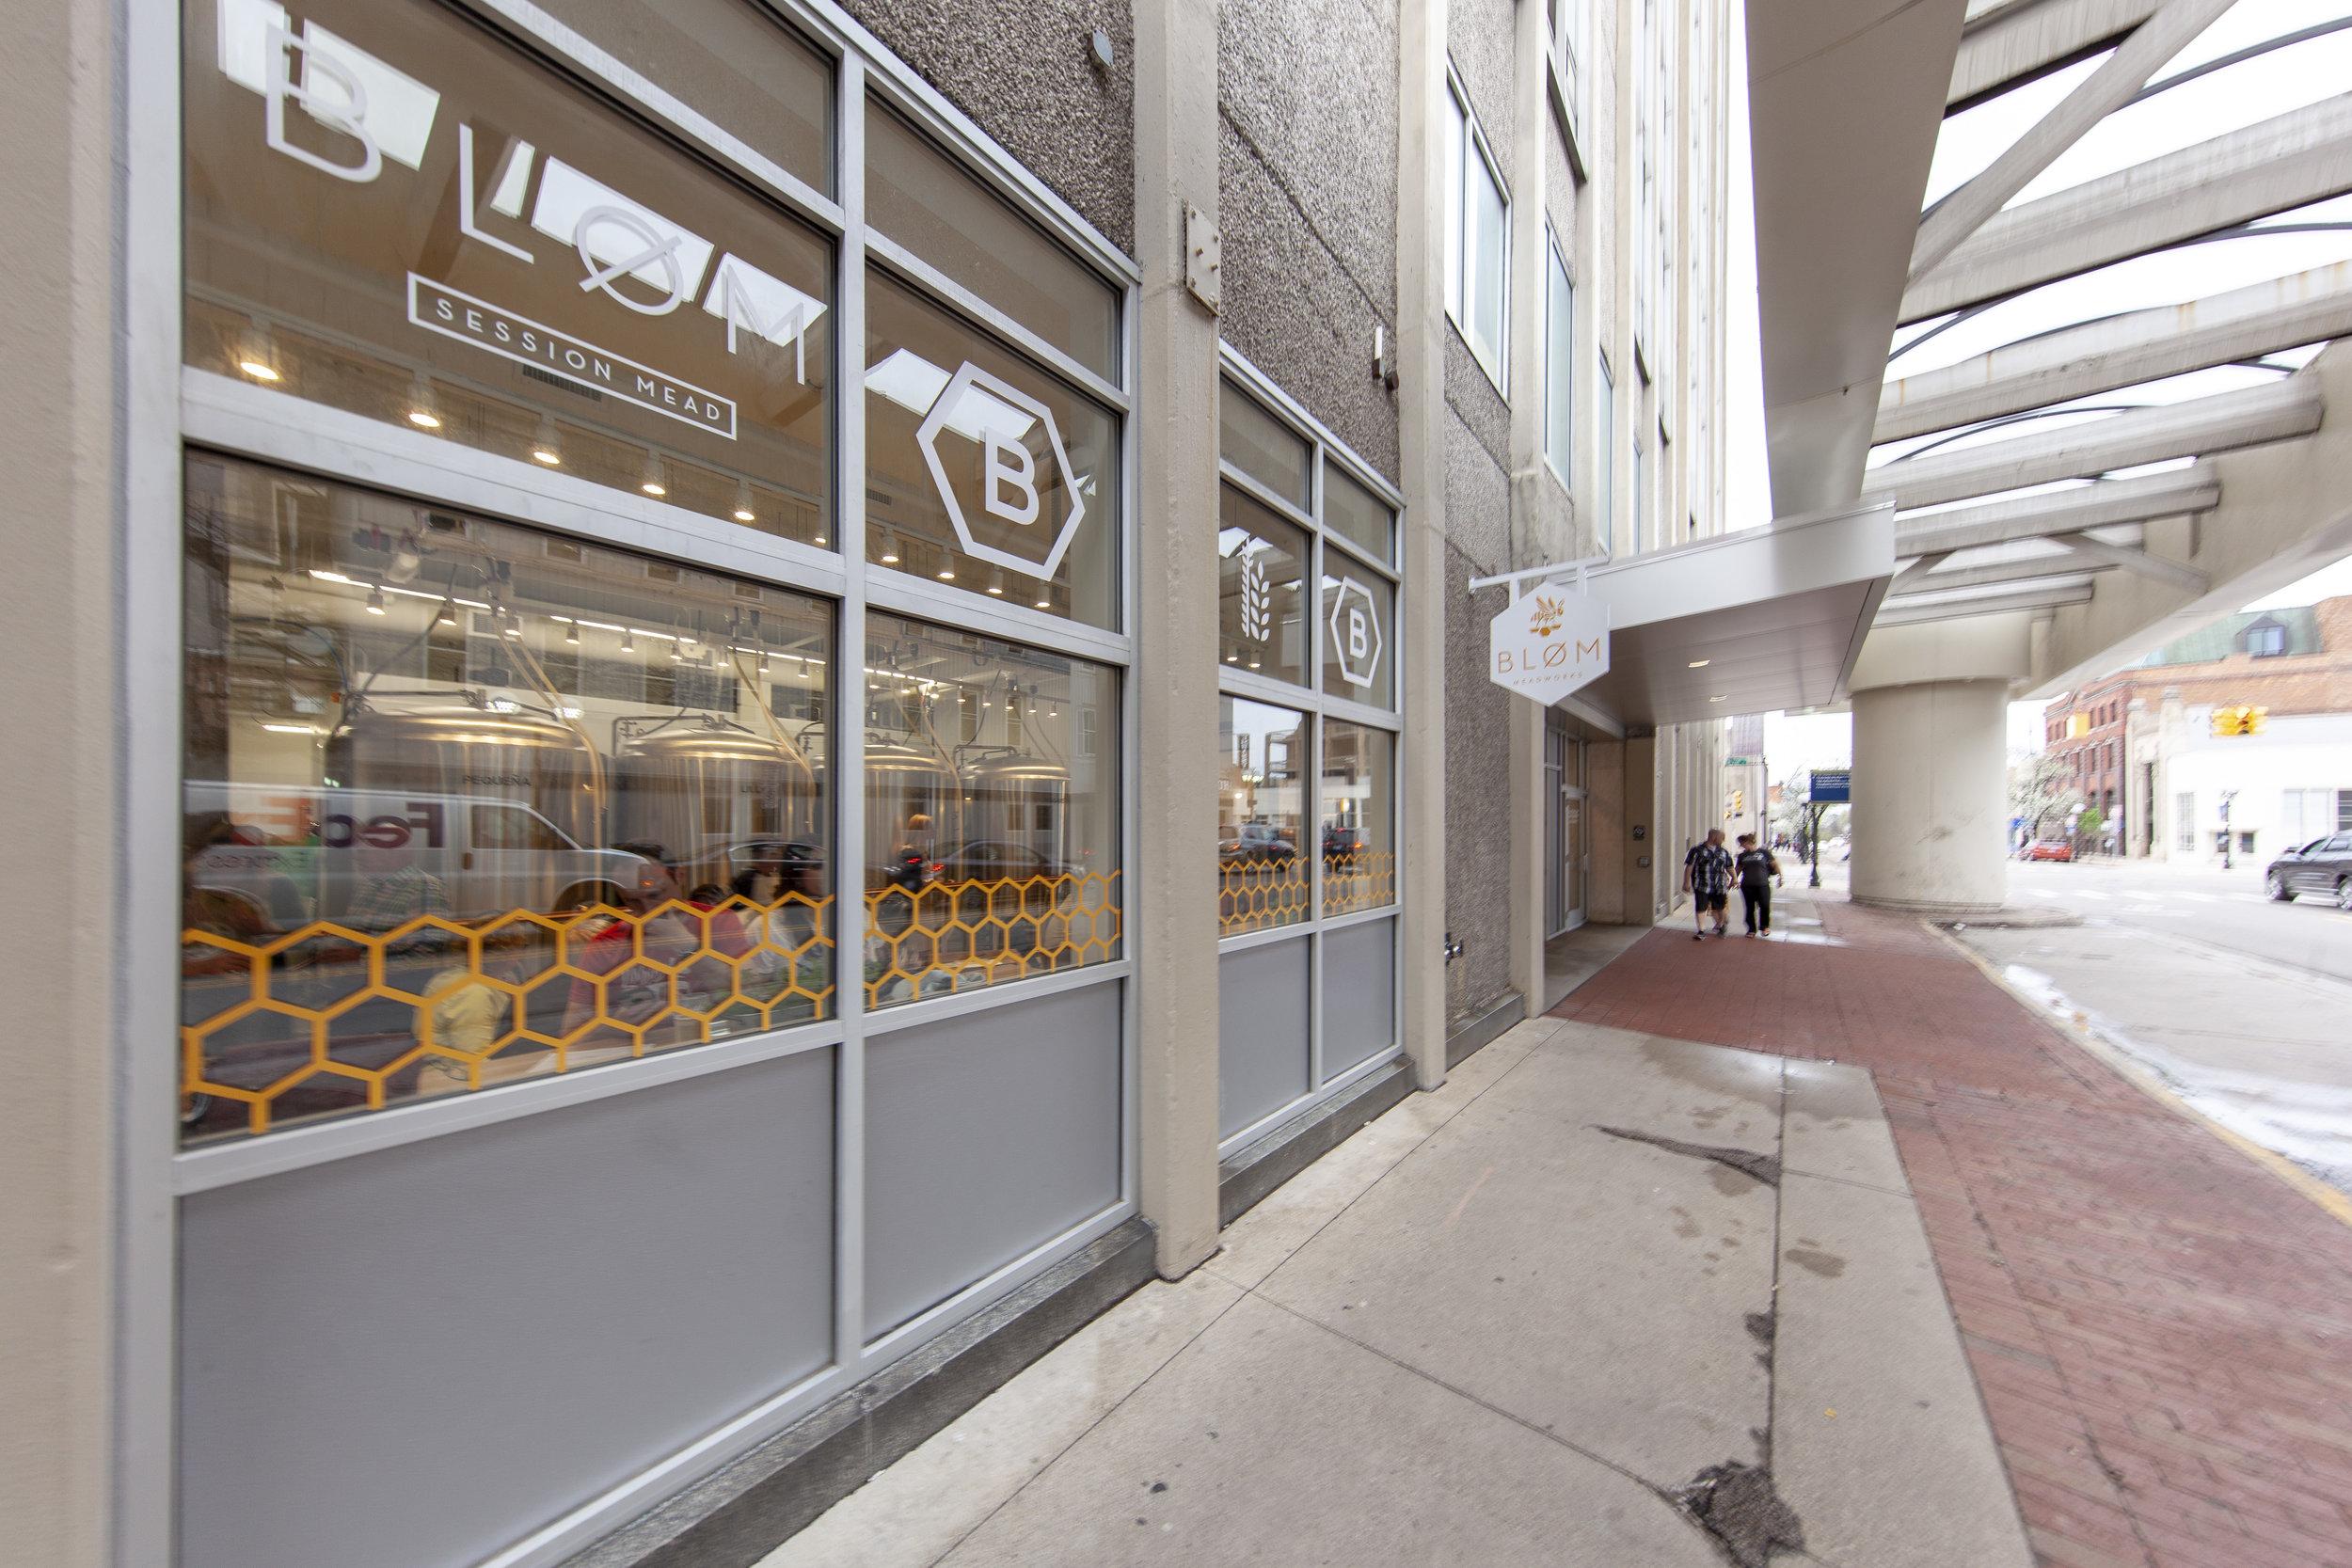 Bløm Meadworks Ann Arbor by Synecdoche Design Studio